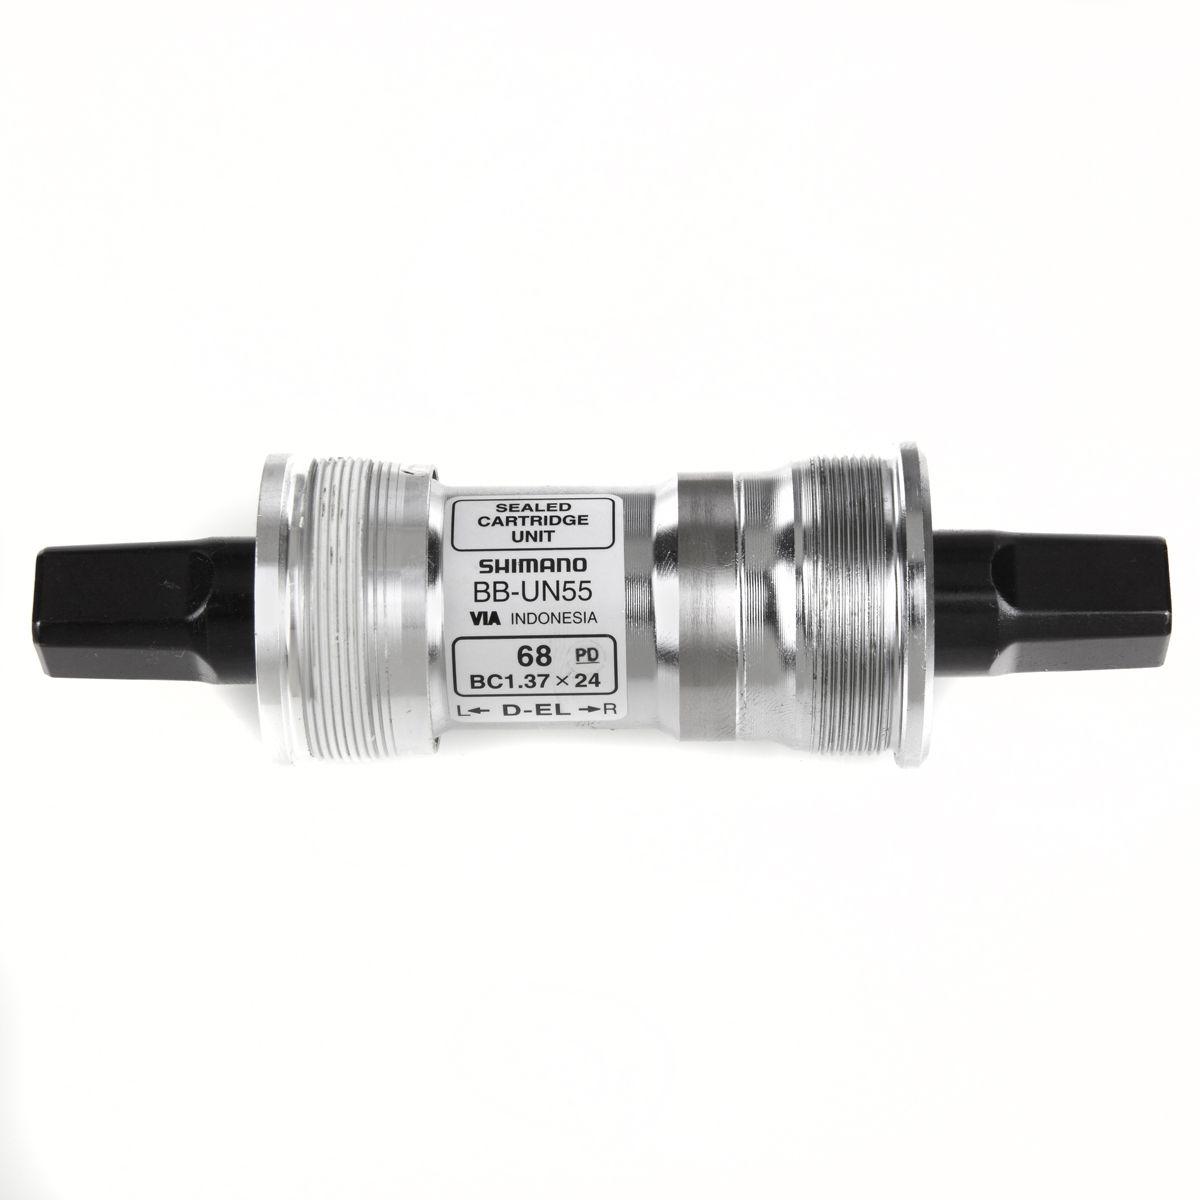 Boîtier de pédalier Shimano BBUN55 Carré BSA 68 x 127,5 mm